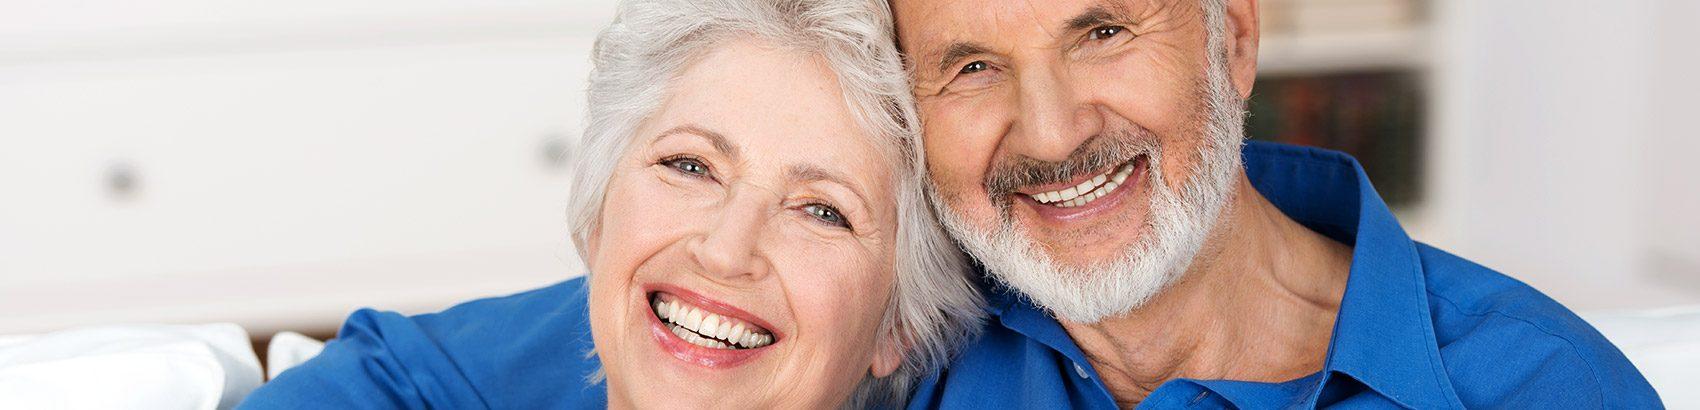 Endodontics - Asuncion Dental Group